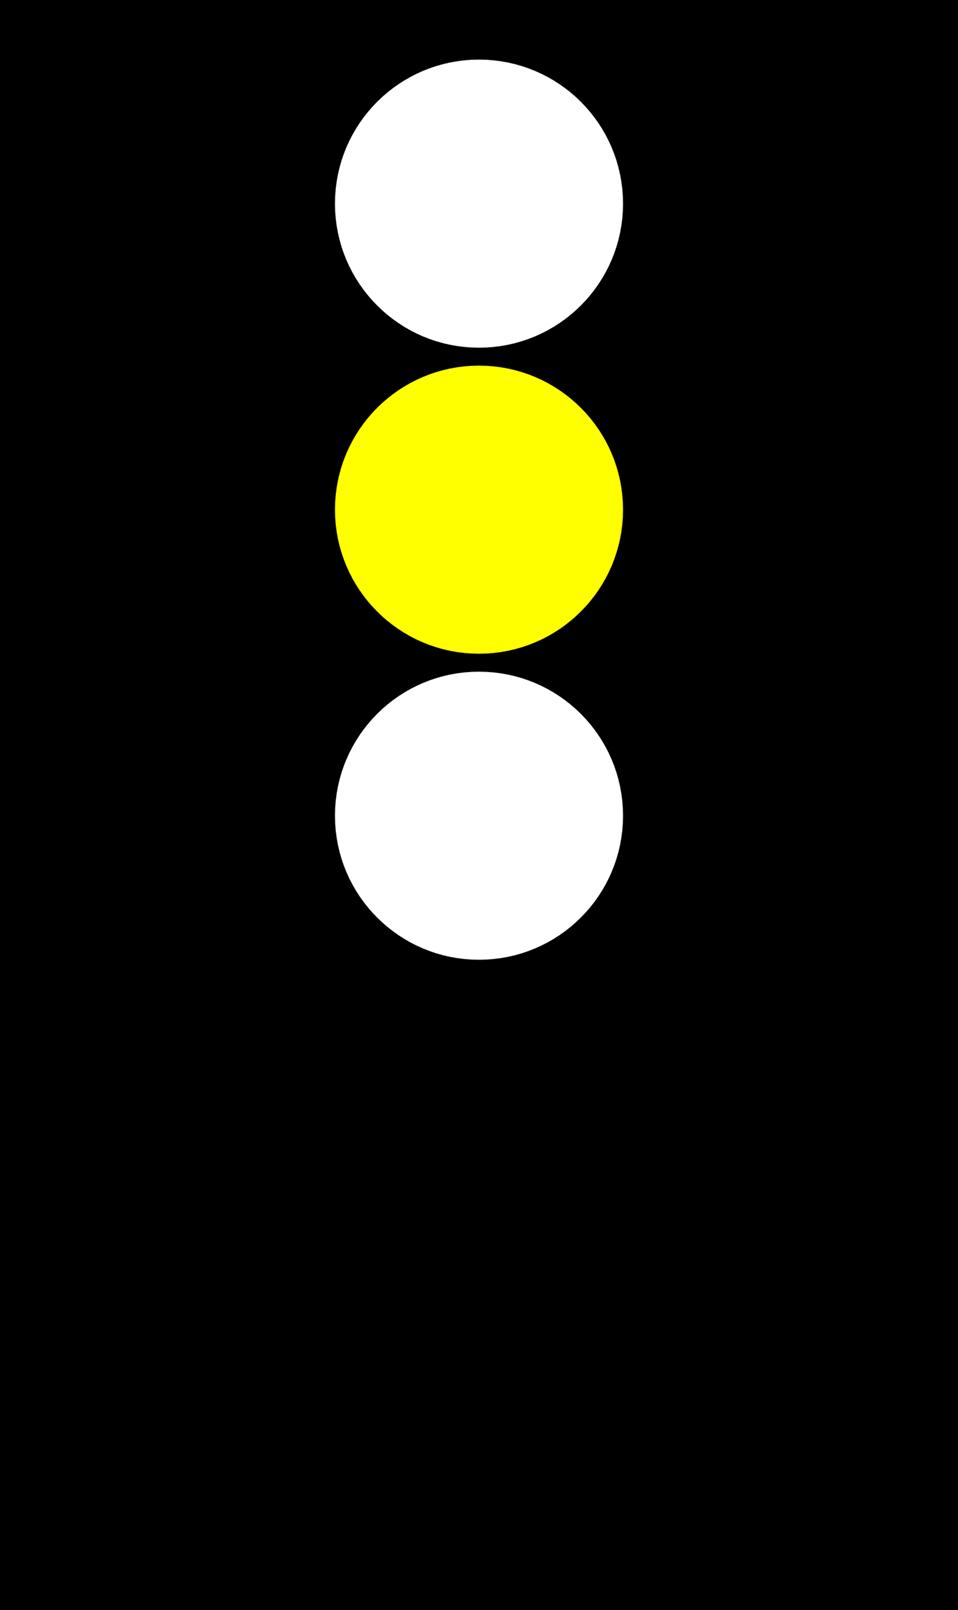 Traffic semaphore yellow light